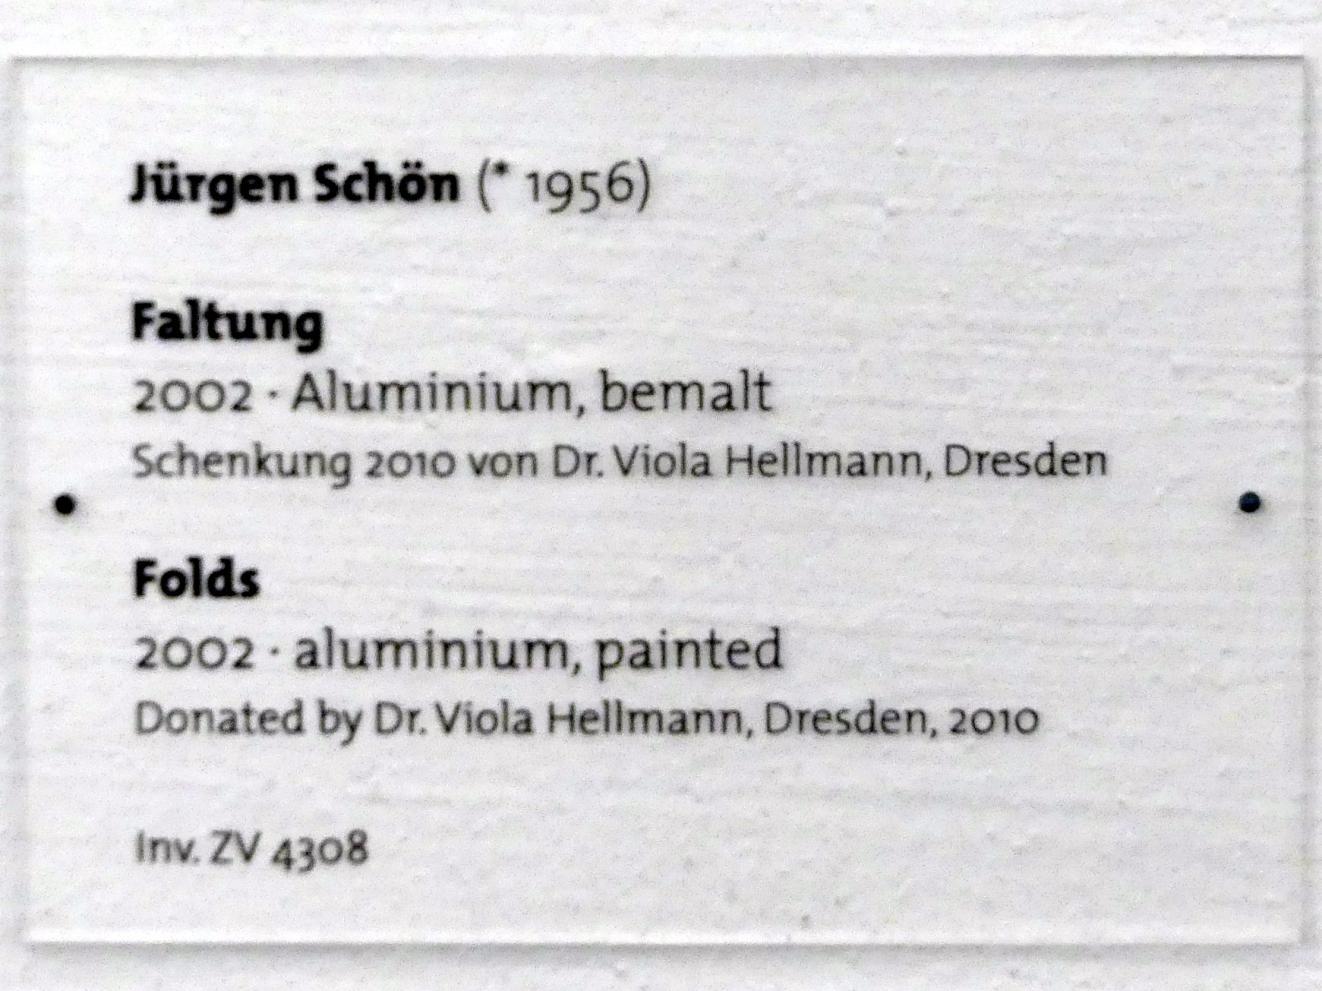 Jürgen Schön: Faltung, 2002